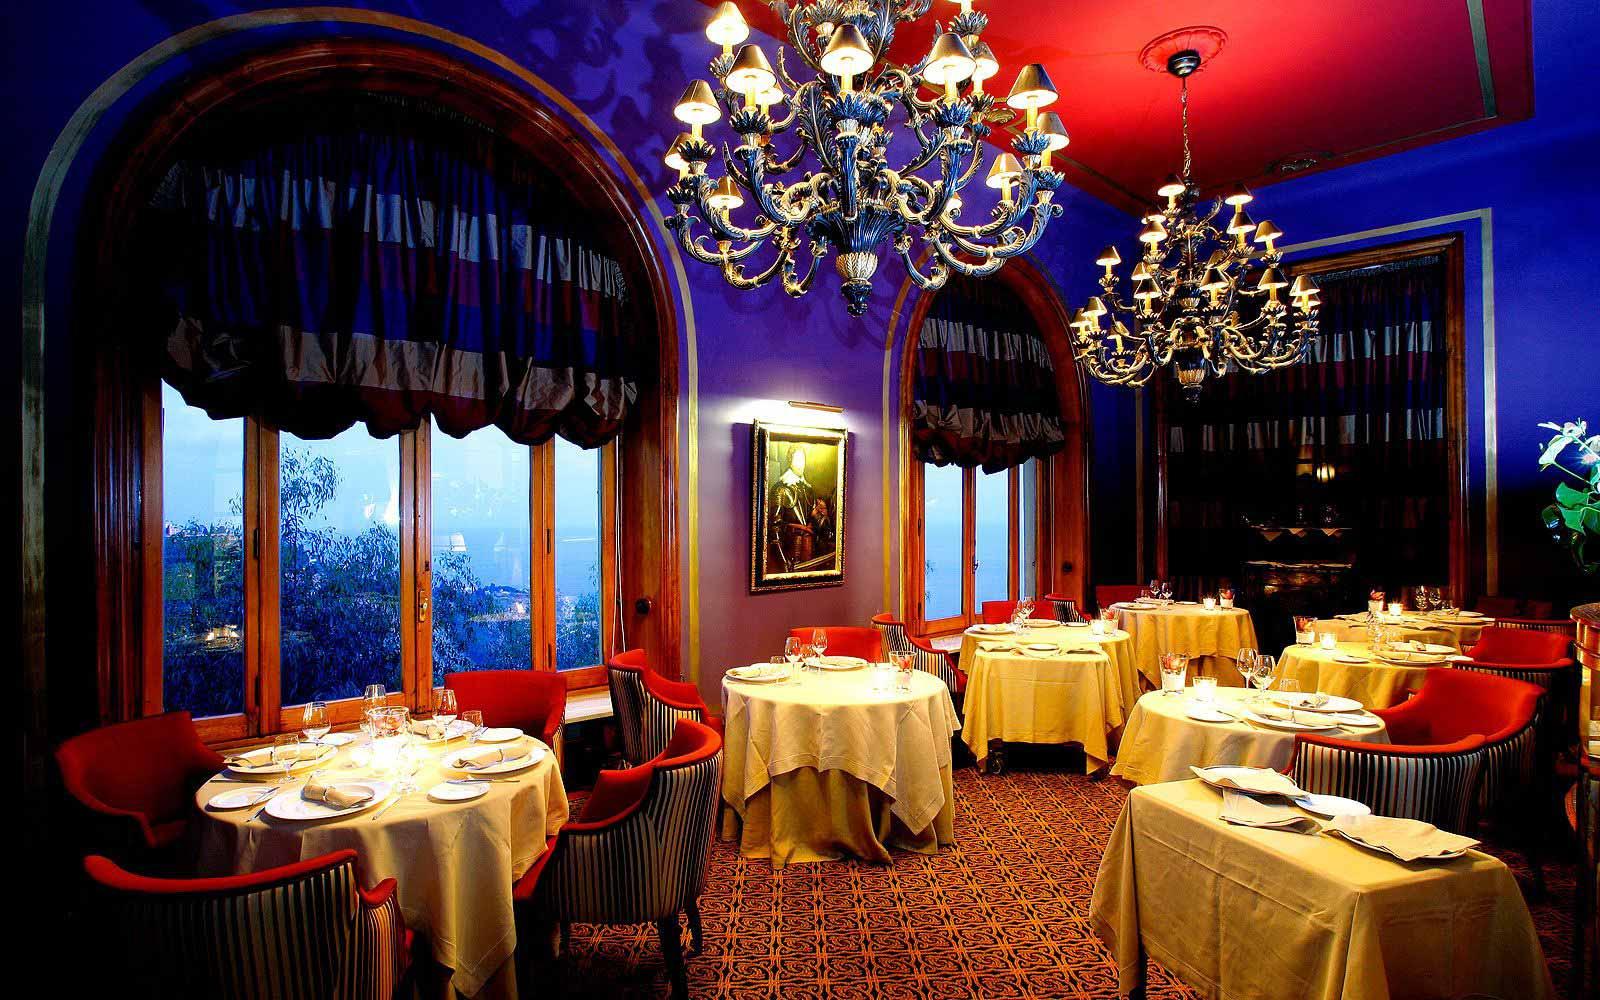 'Principe Cerami' restaurant gourmet food at the San Domenico Palace Hotel